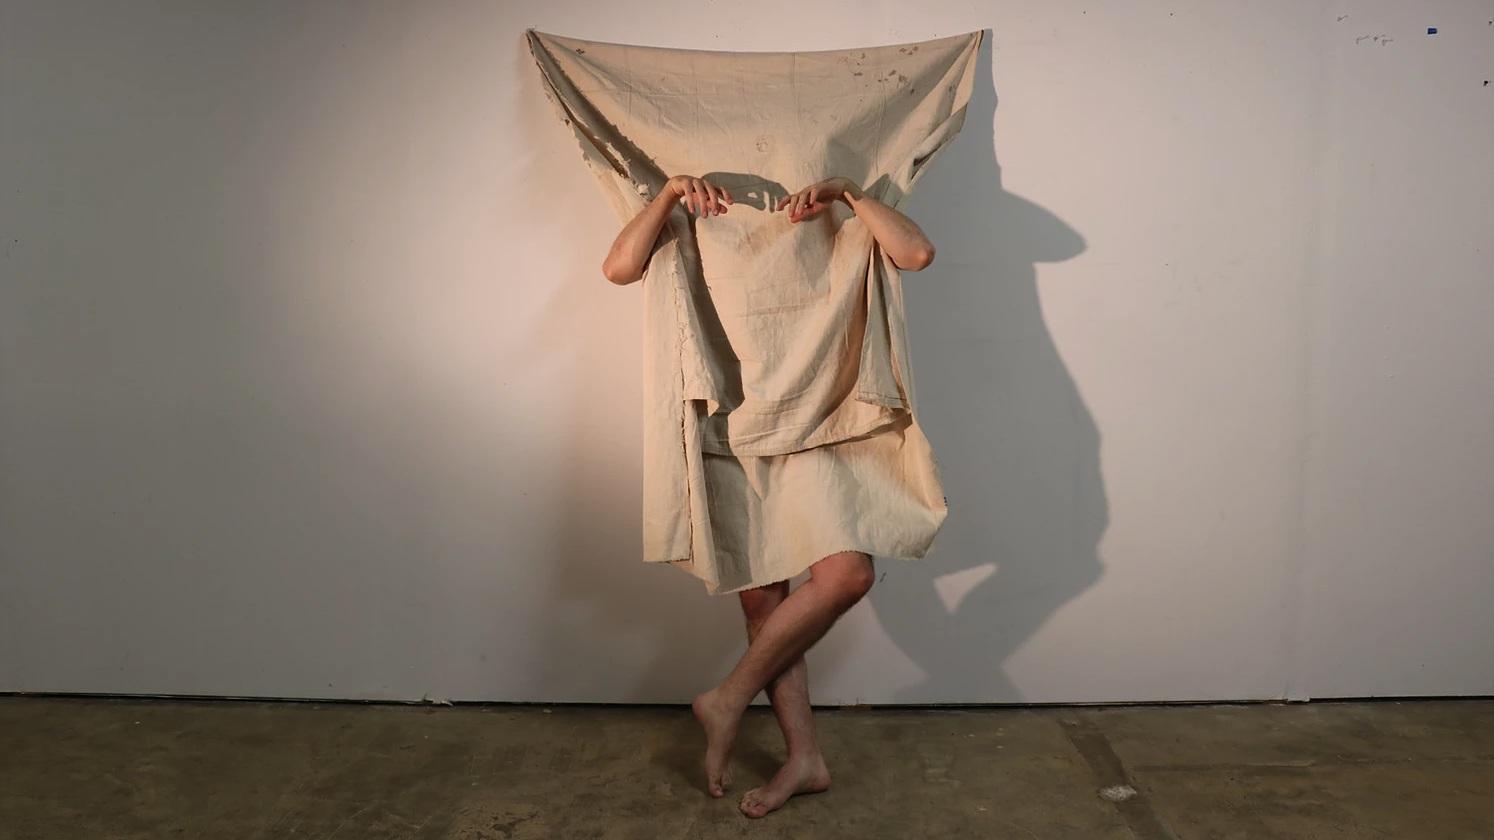 Canvas Dancer, wall-bound canvas performance costume, Peder & Hendrik 2018